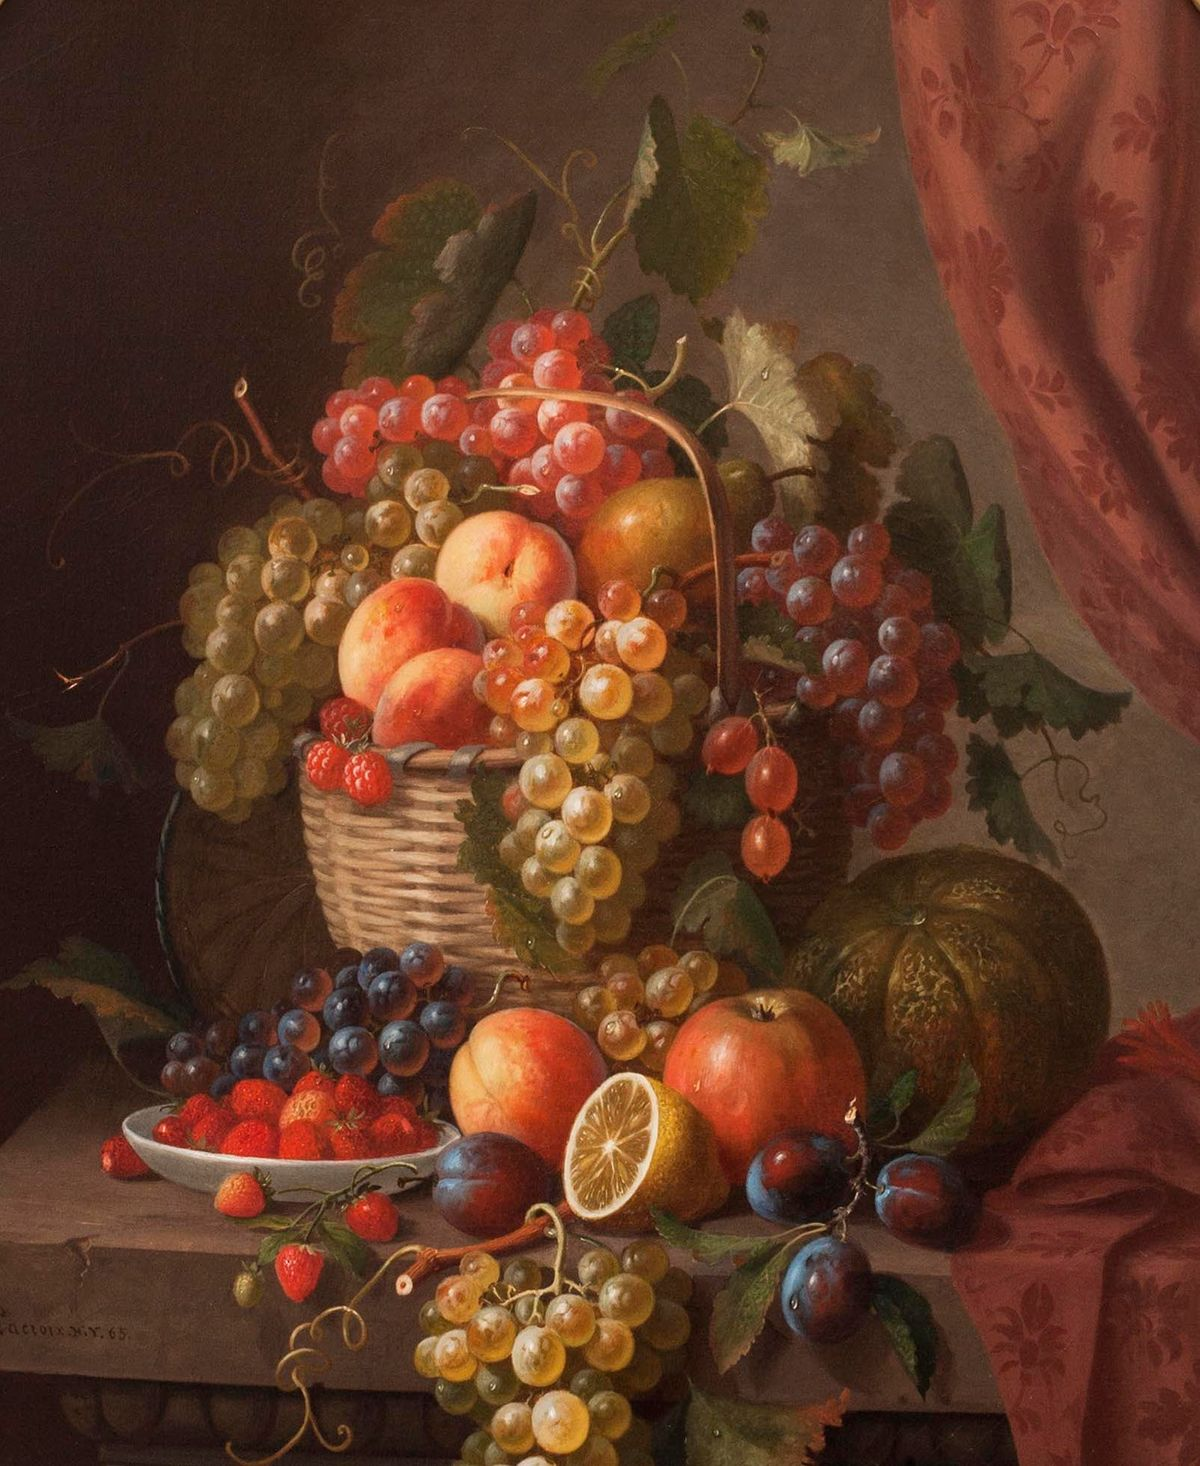 PAUL LACROIX STILL LIFE, BASKET OF FRUIT, UNFRAMED